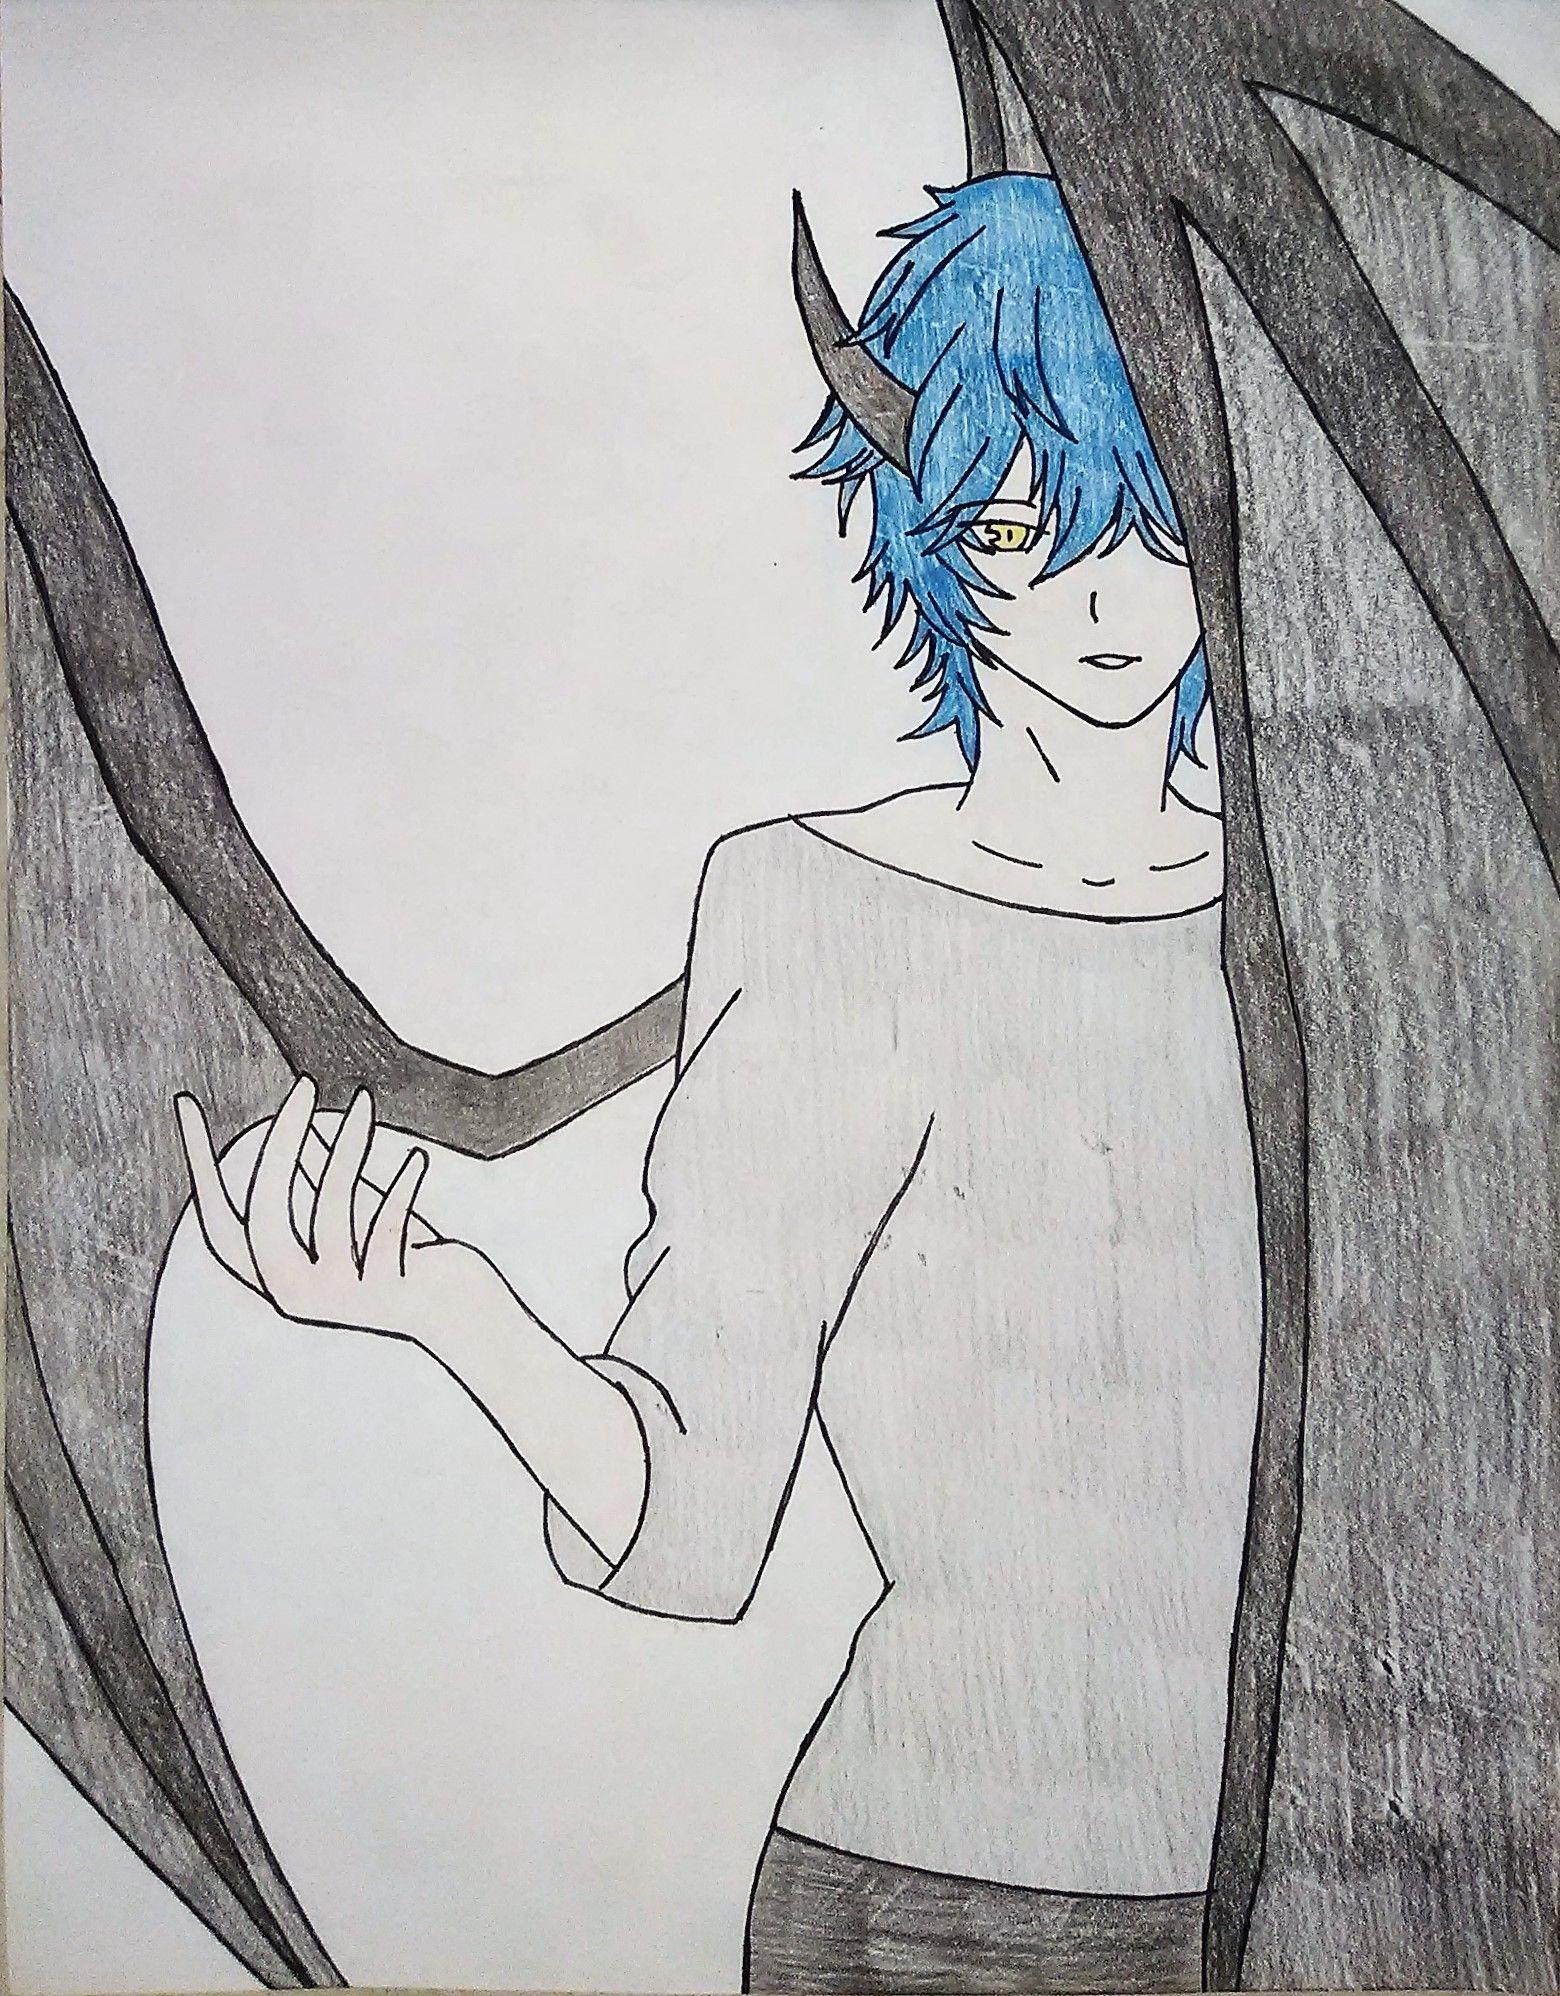 Anime Devil Boy Drawing